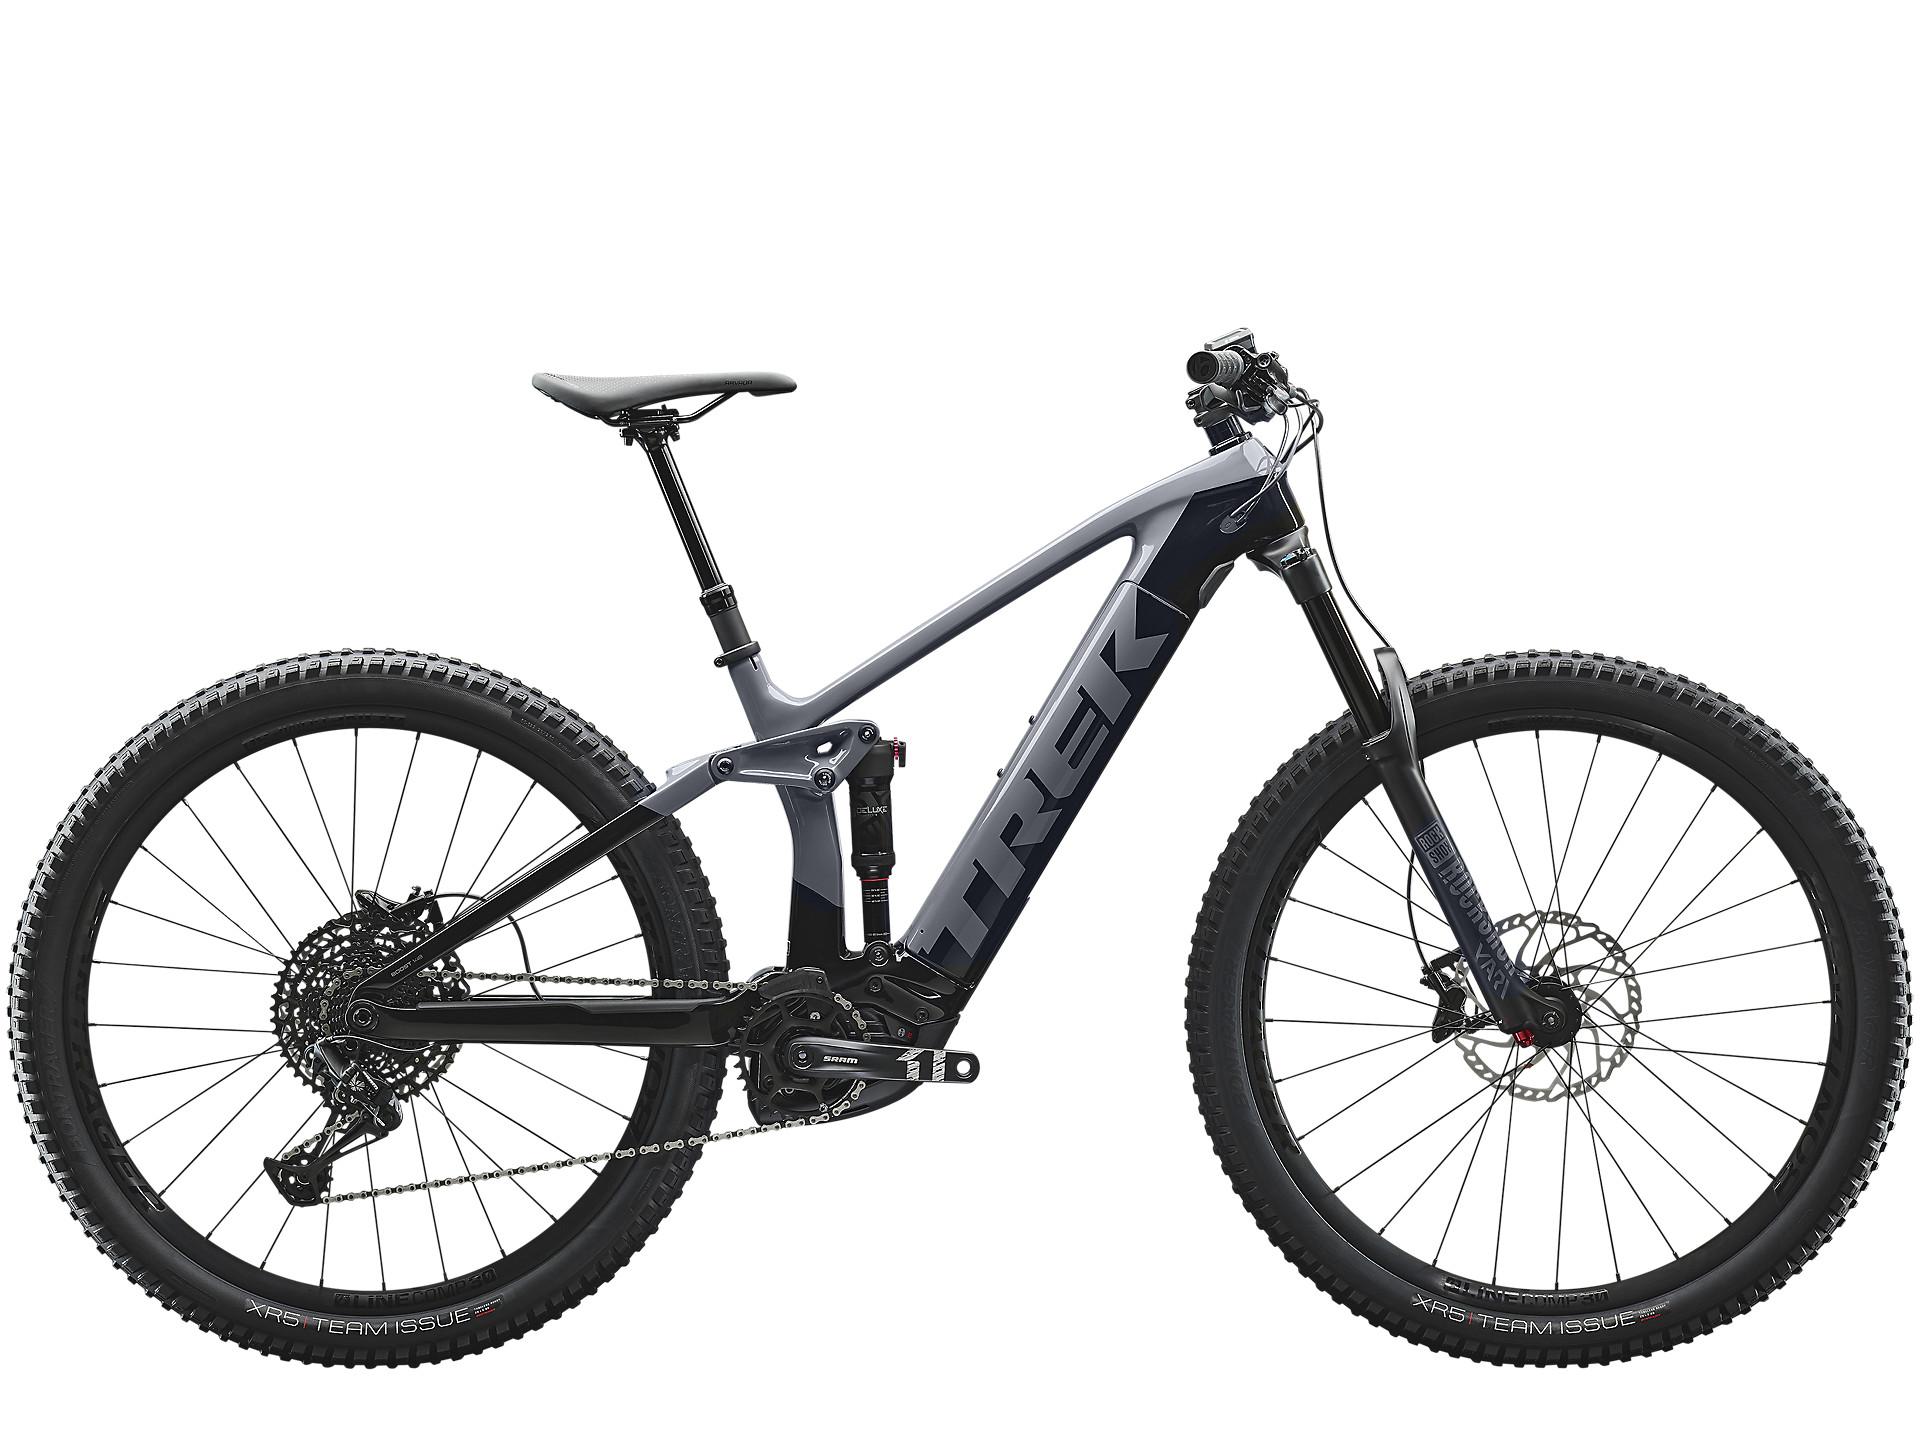 ebike trek 2020 catalogo e listino prezzi listini prezzi test bici. Black Bedroom Furniture Sets. Home Design Ideas